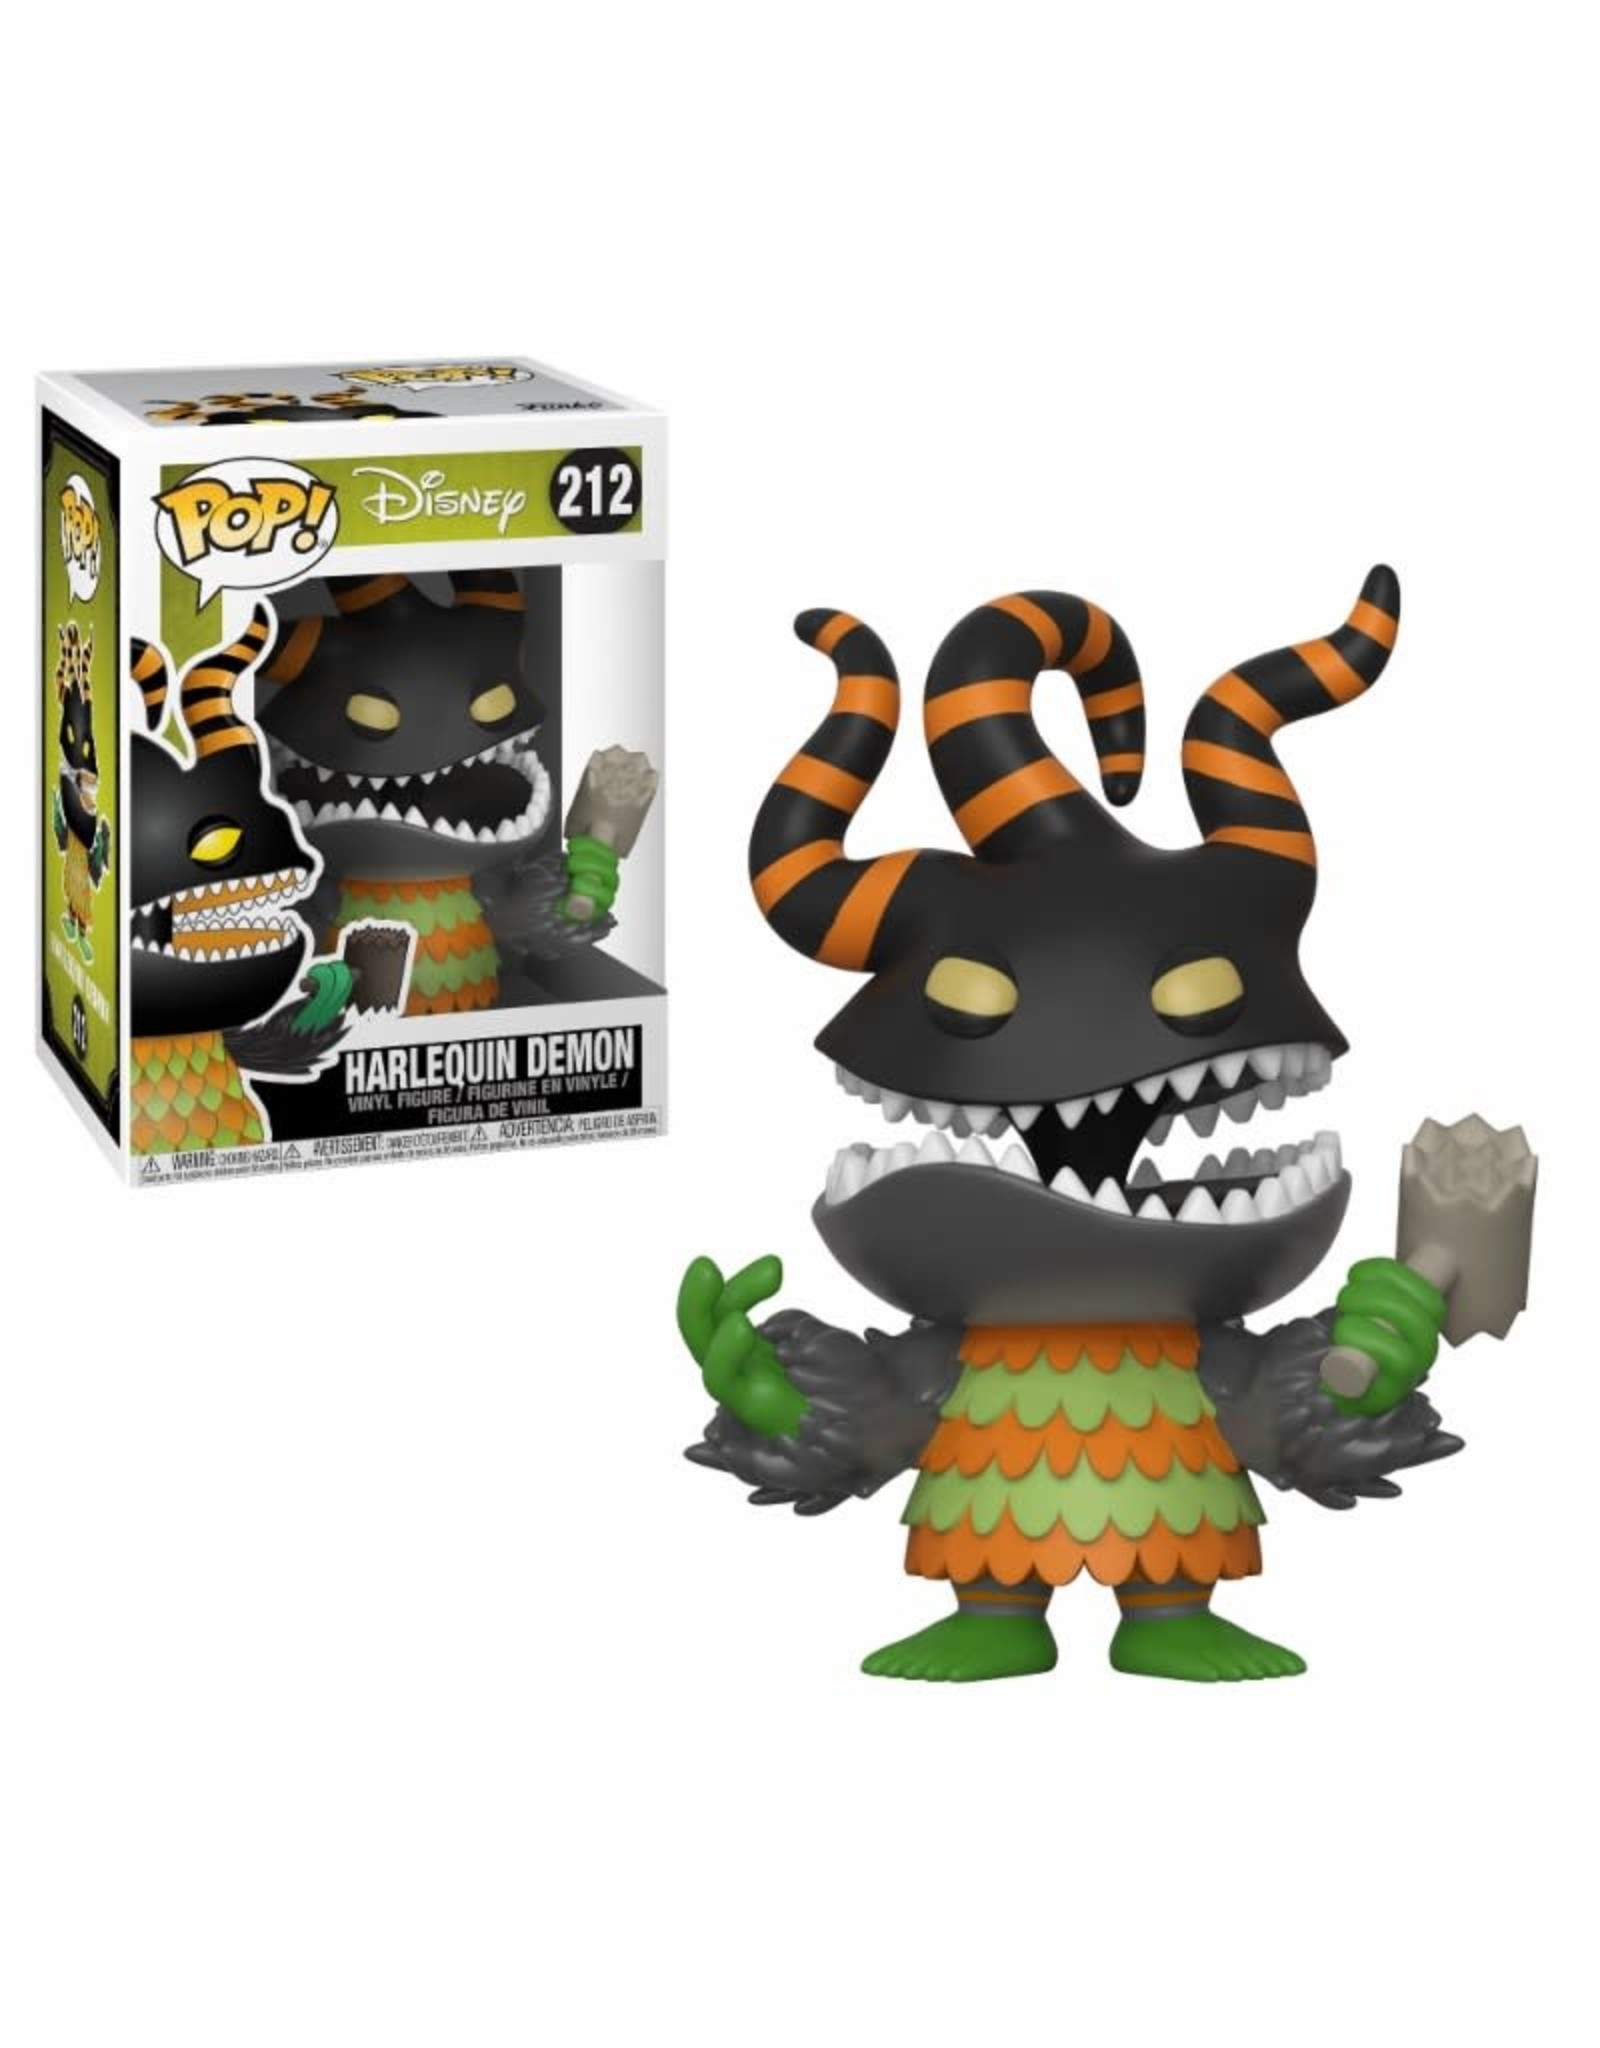 Funko Pop! Funko Pop! Disney nr212 Harlequin Demon